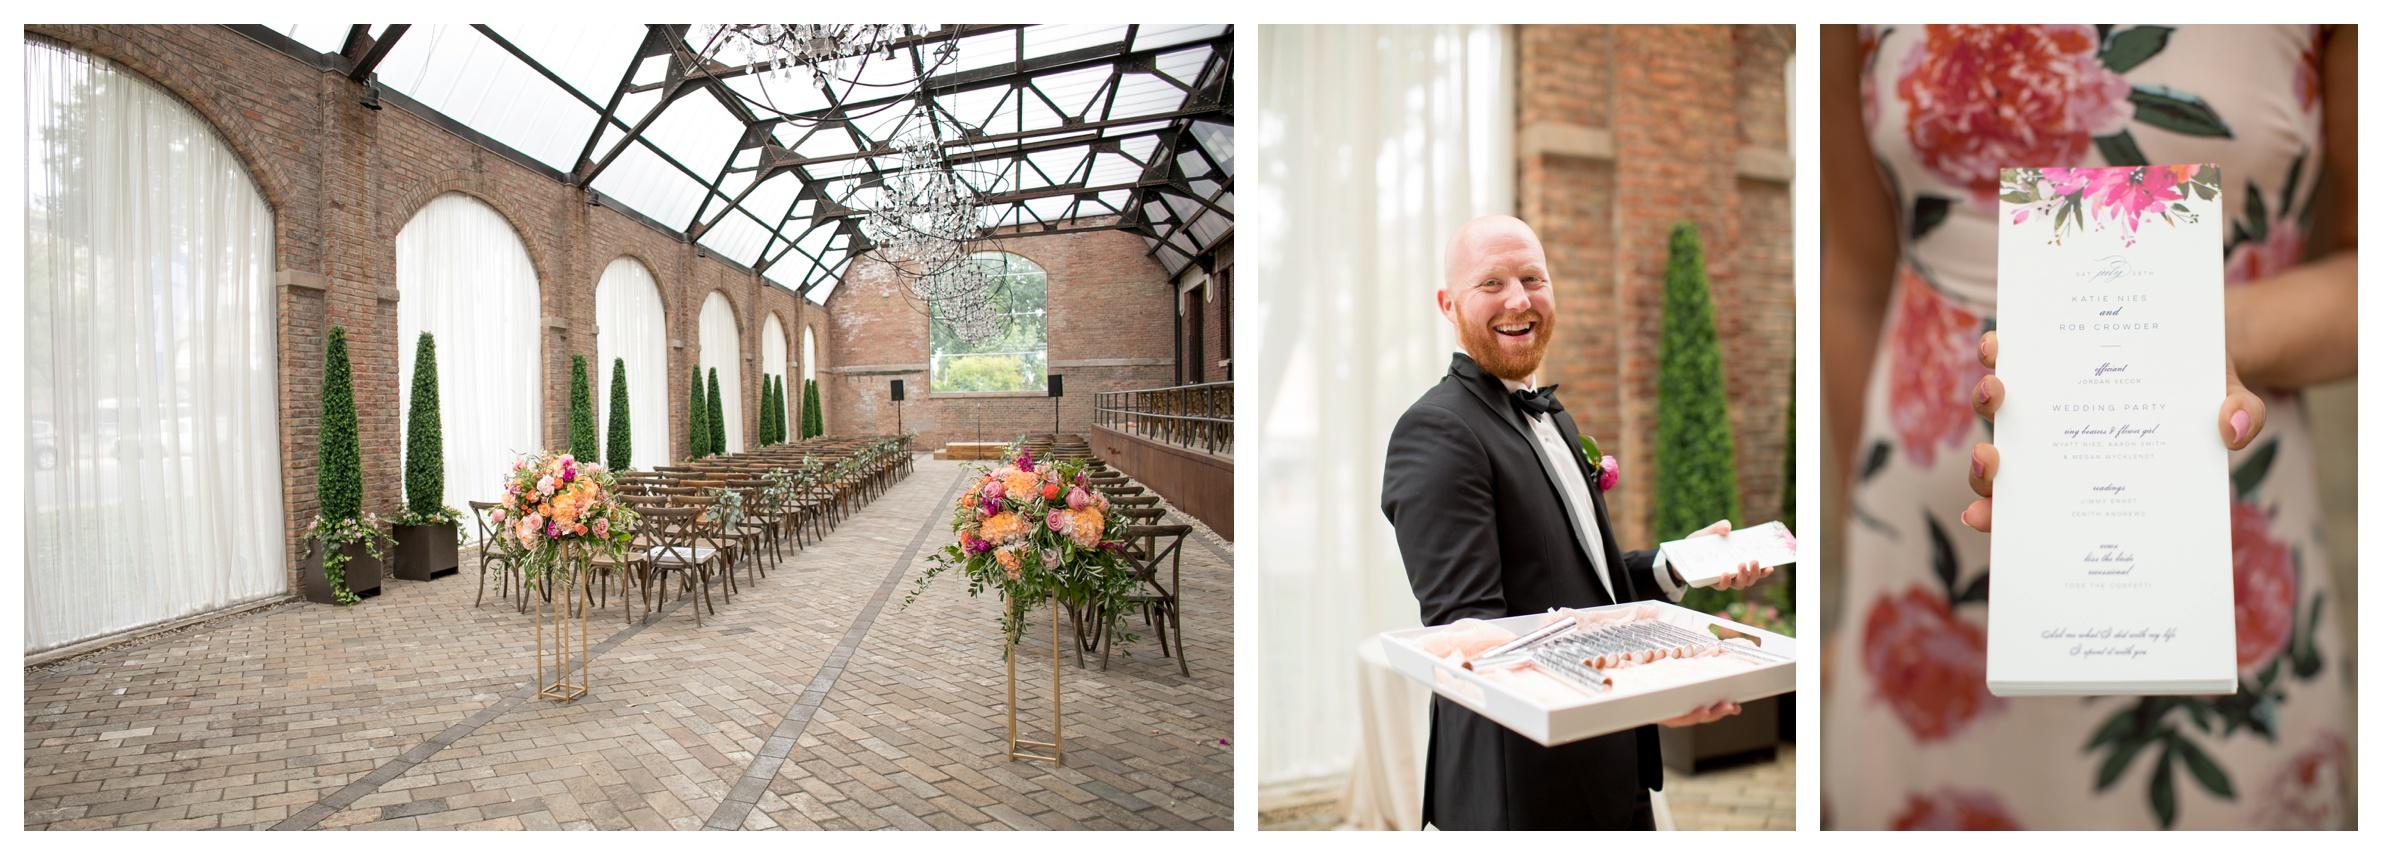 bridgeport-art-center-sculpture-garden-wedding-ceremony